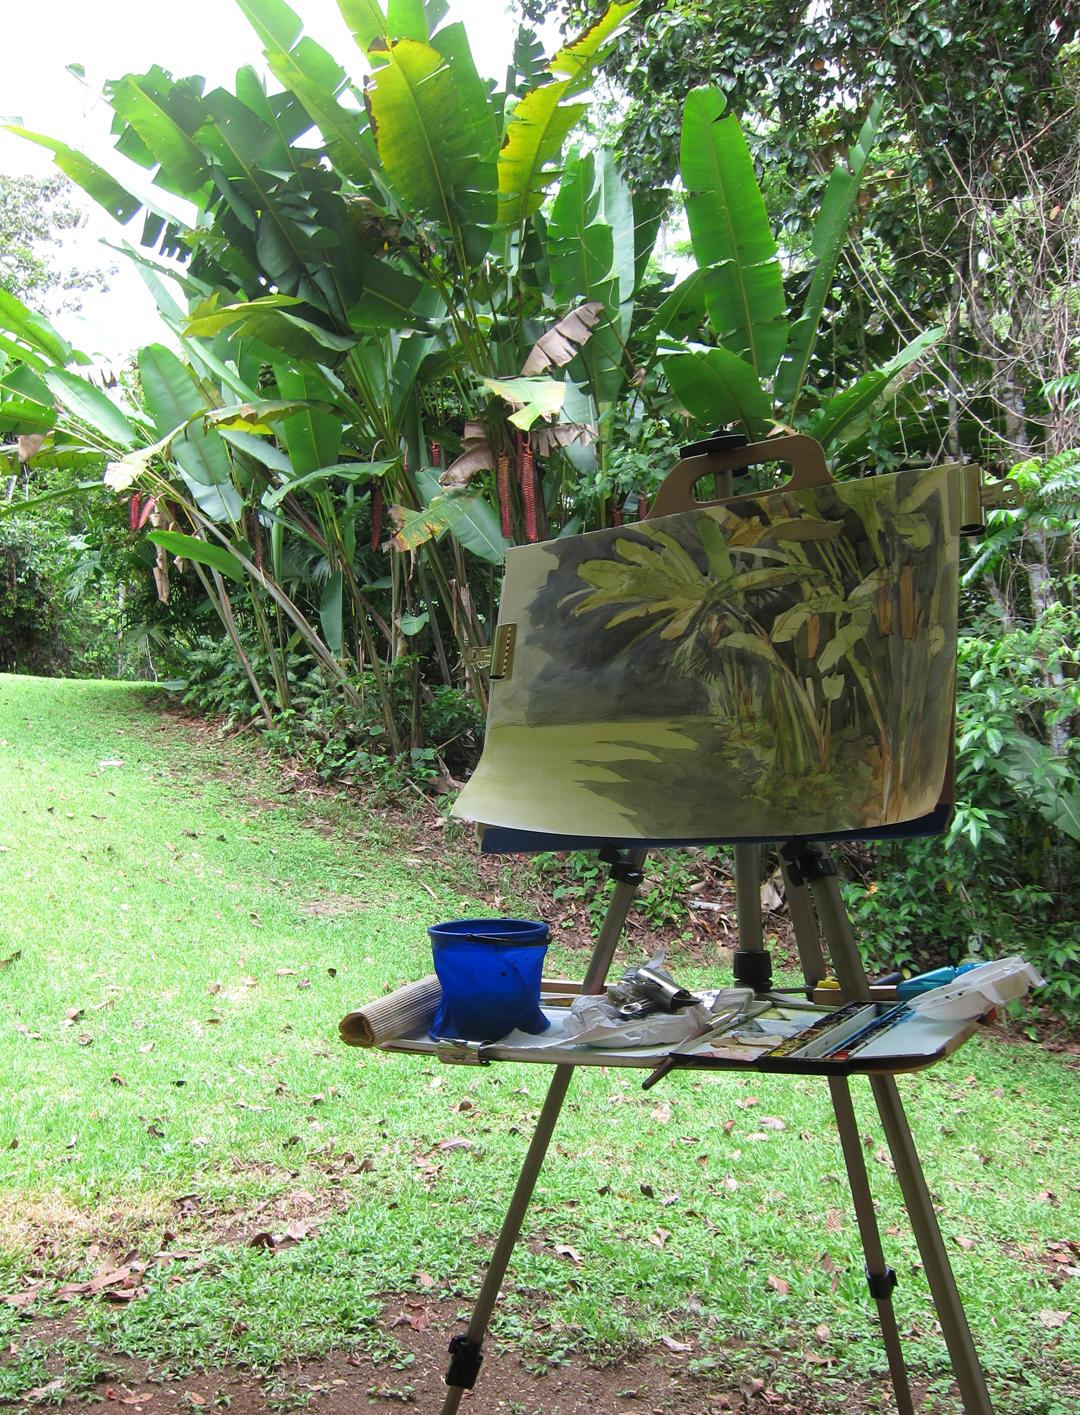 Leaves Paintings And Drawings Painting Big Leaves in